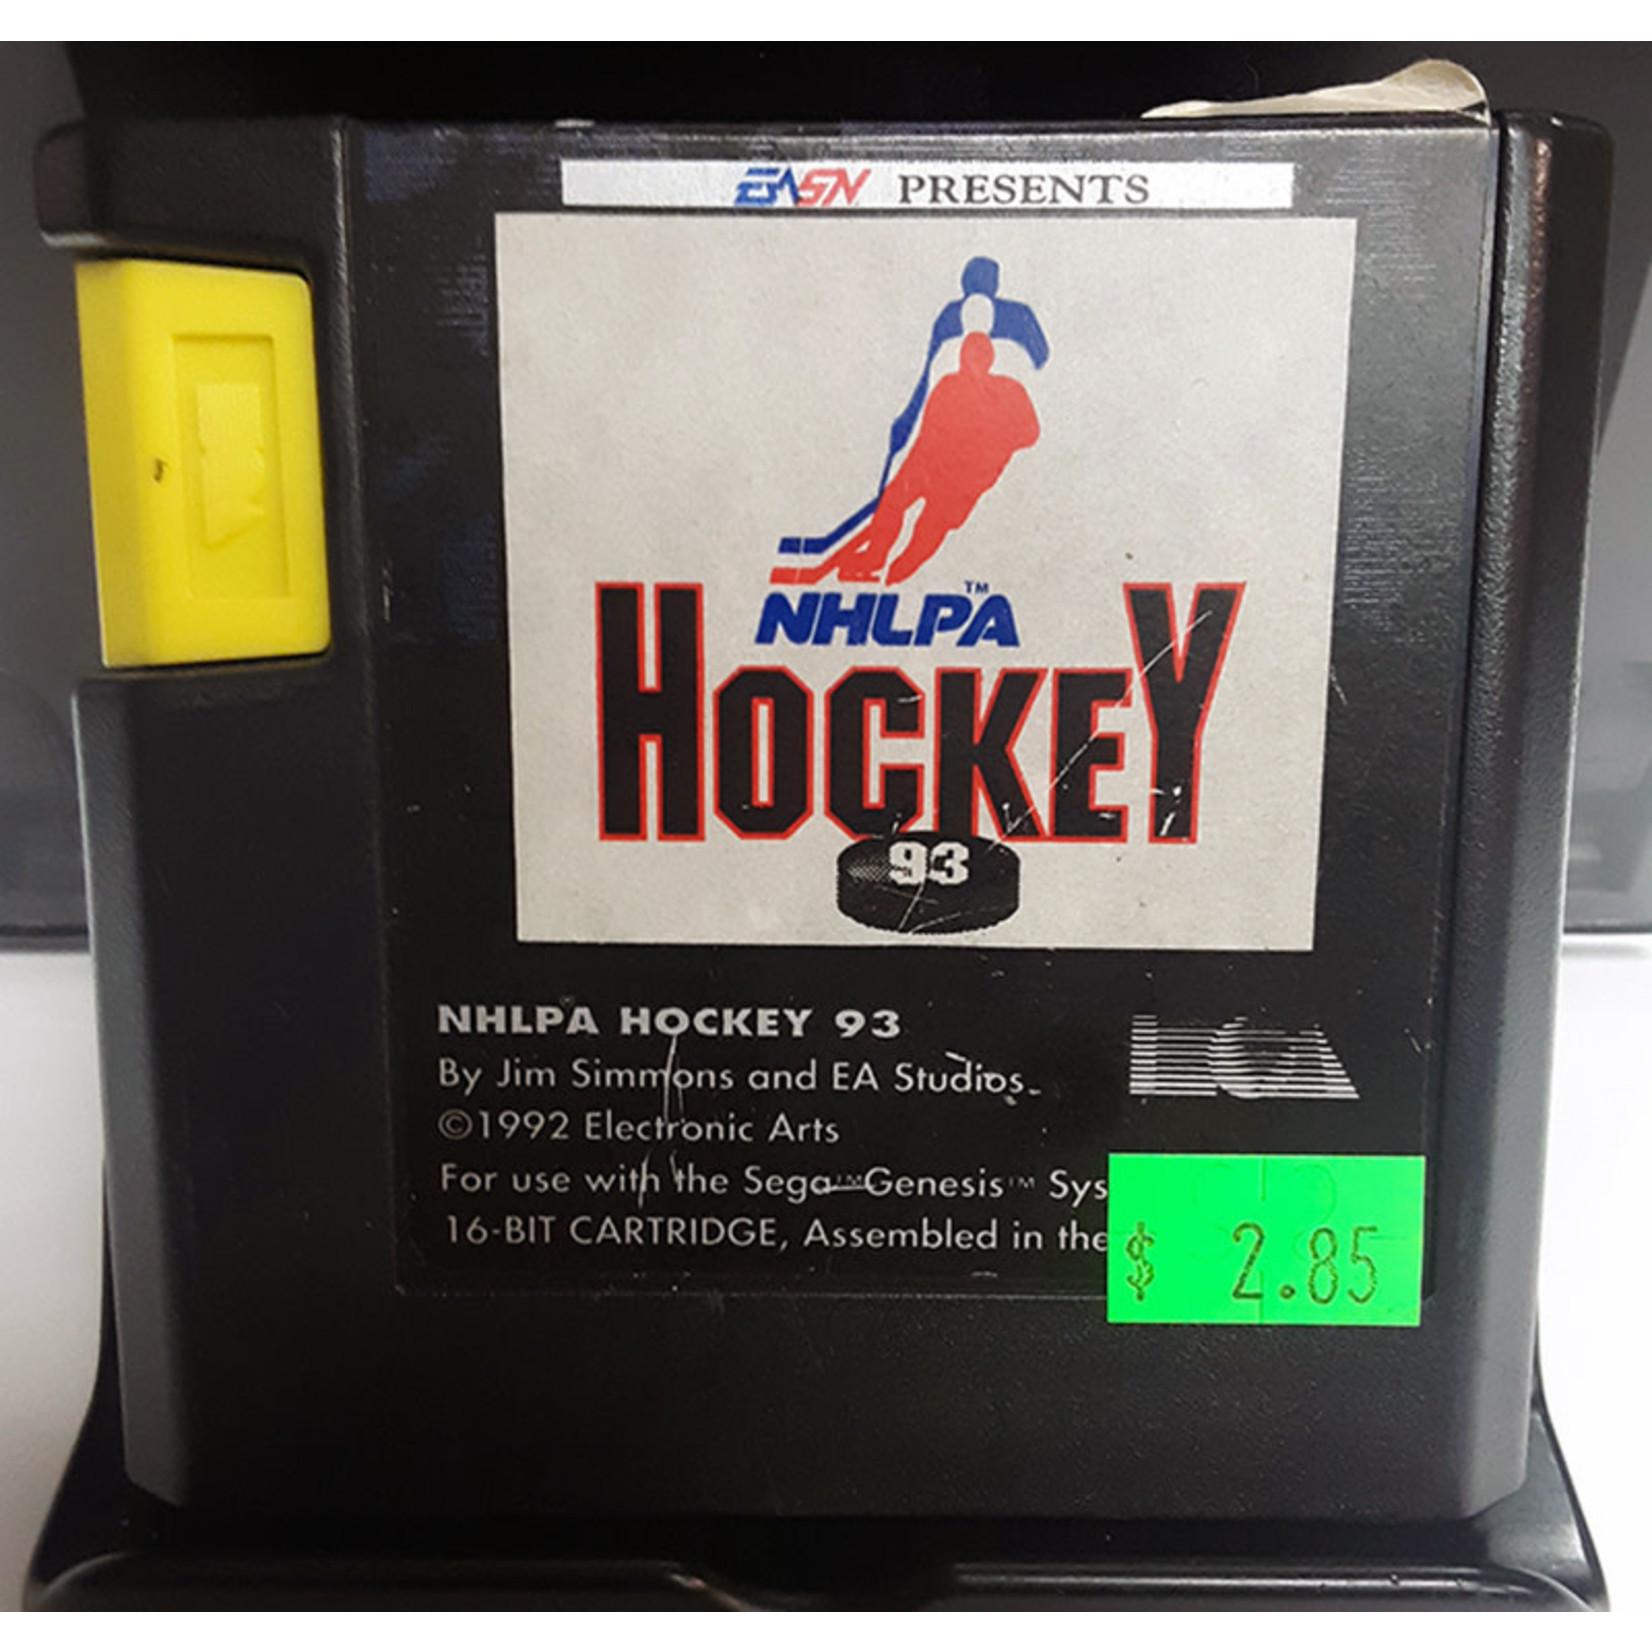 sgu-NHLPA Hockey 93 (cartridge)